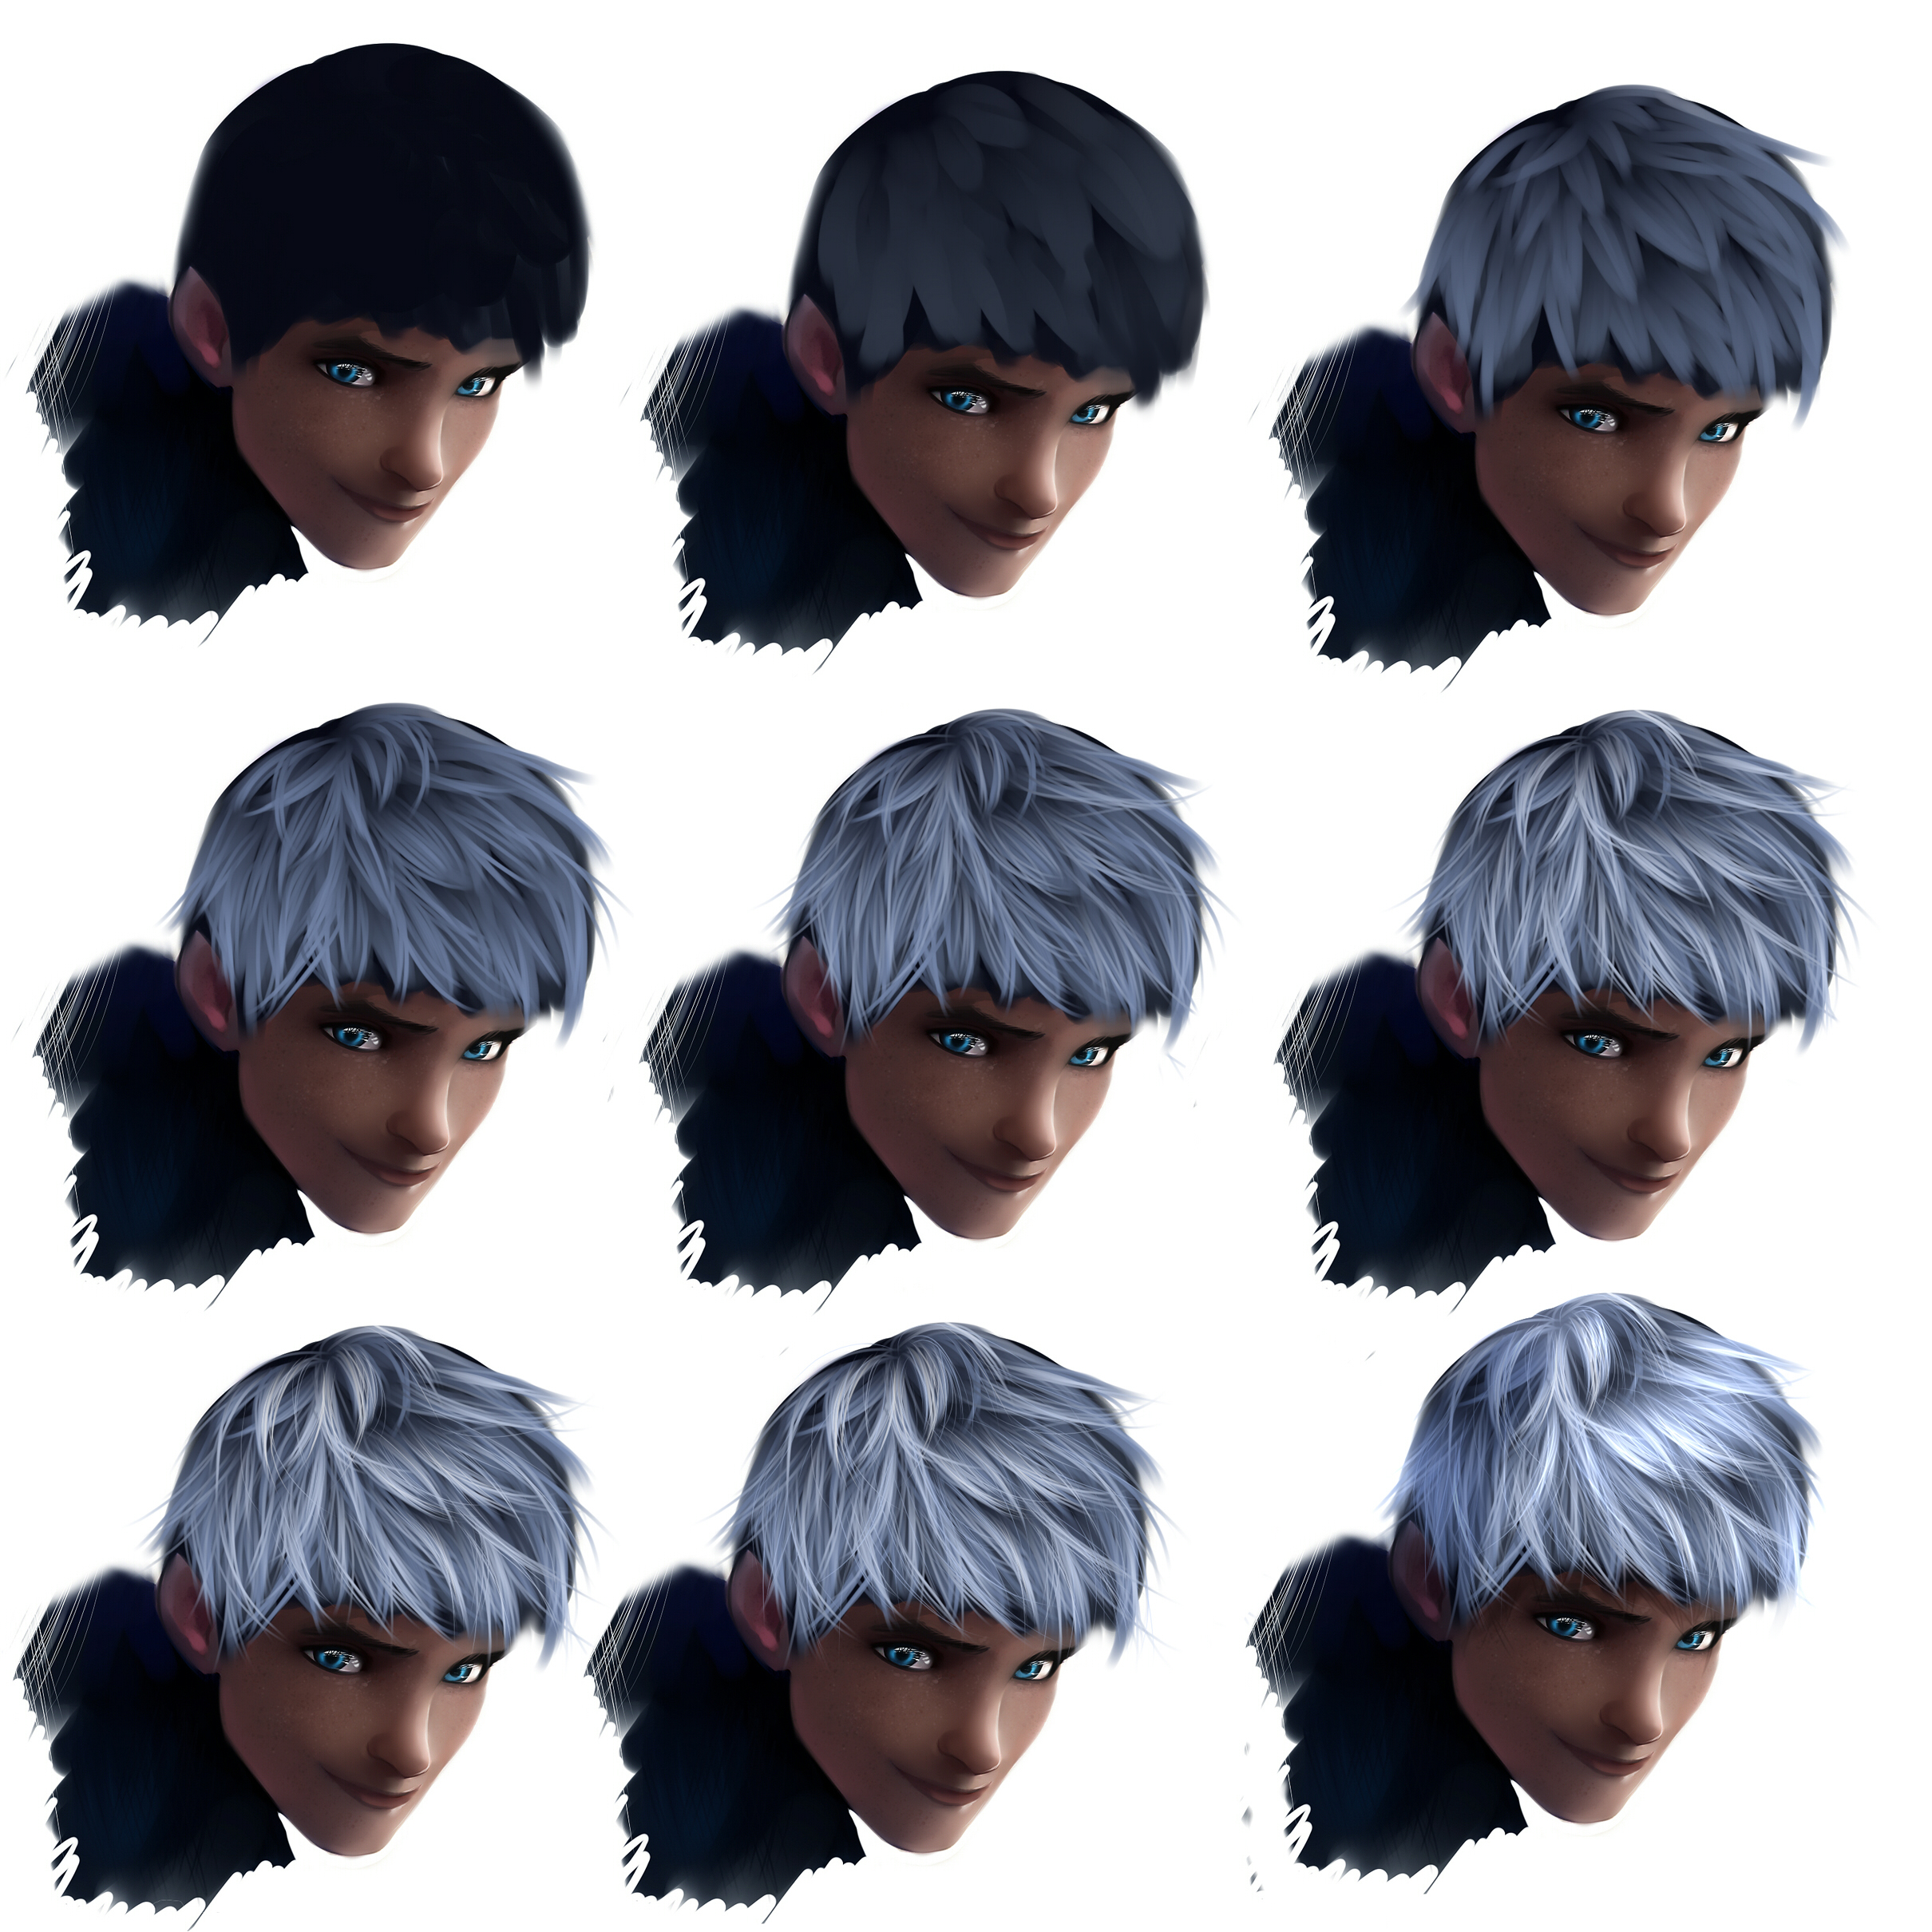 Hair tutorial - Jack Frost